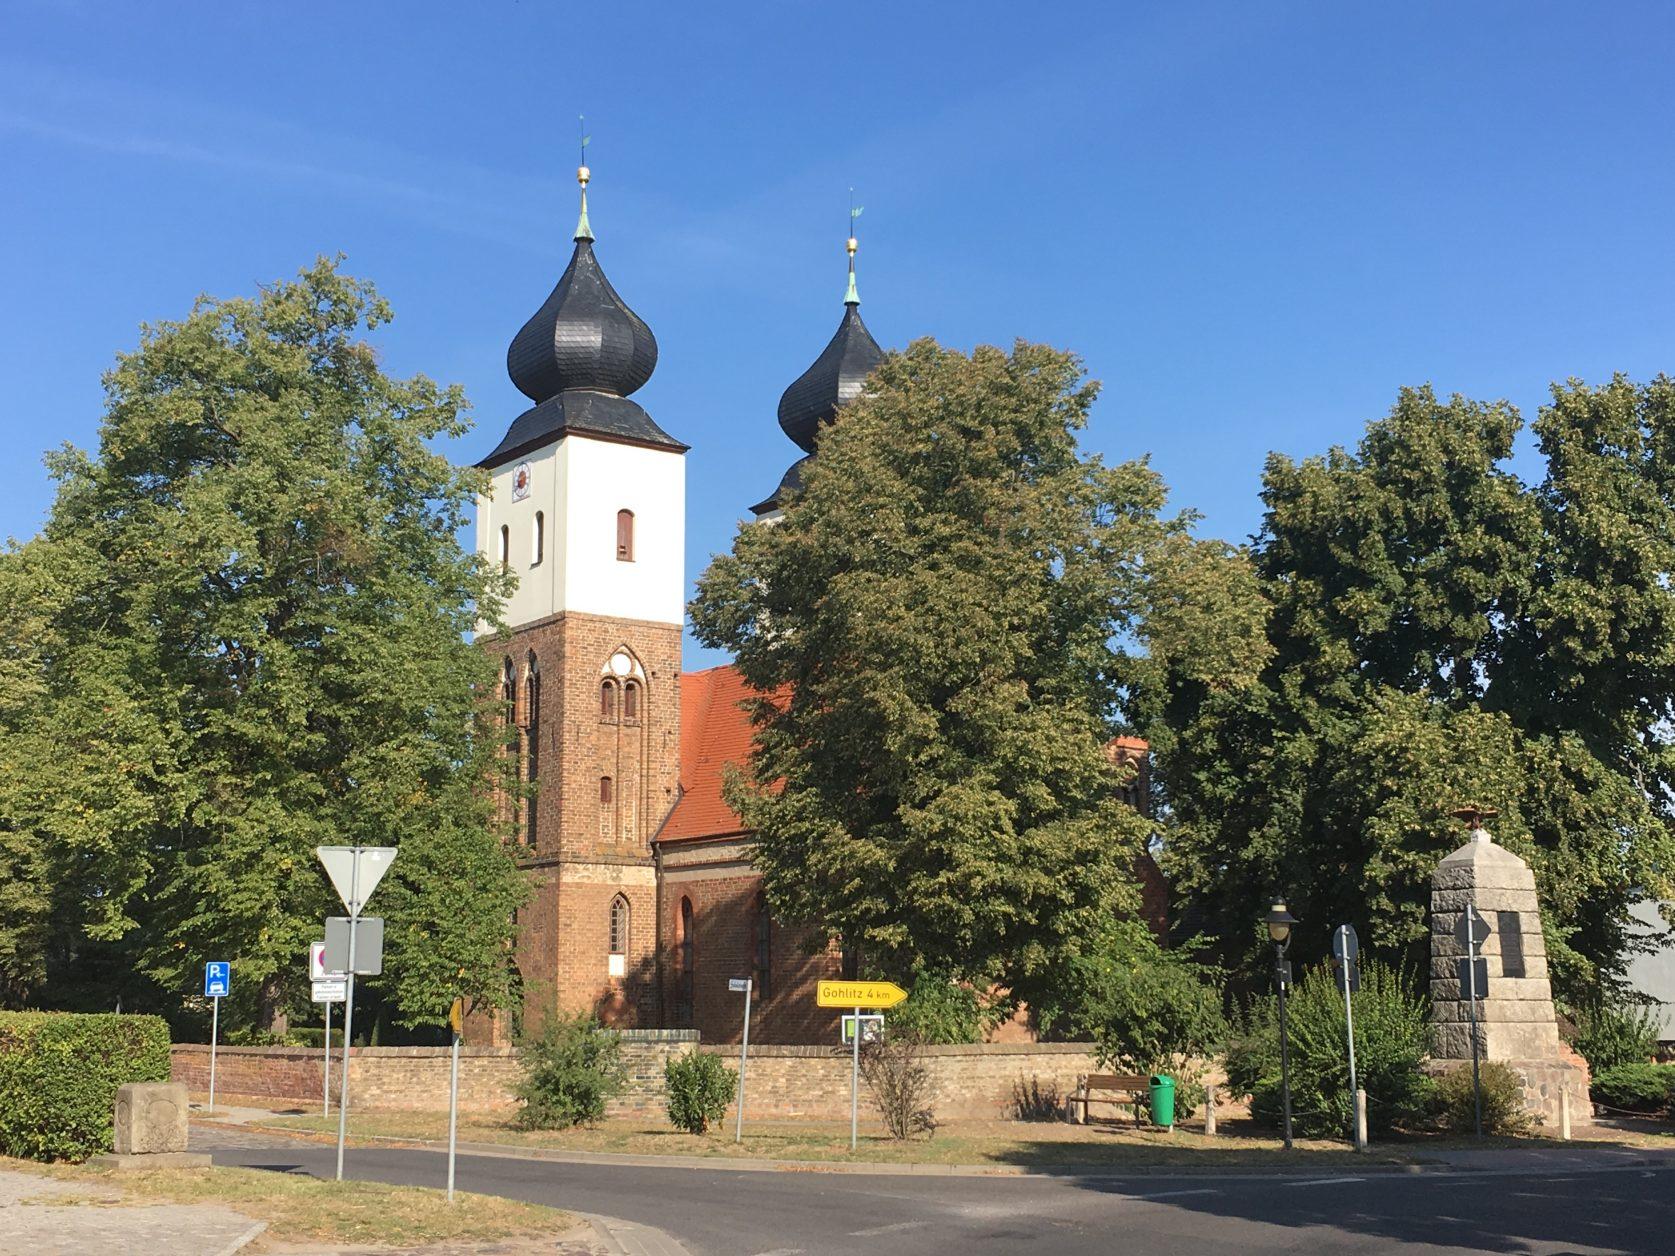 Dorfkirche Tremmen Havelland